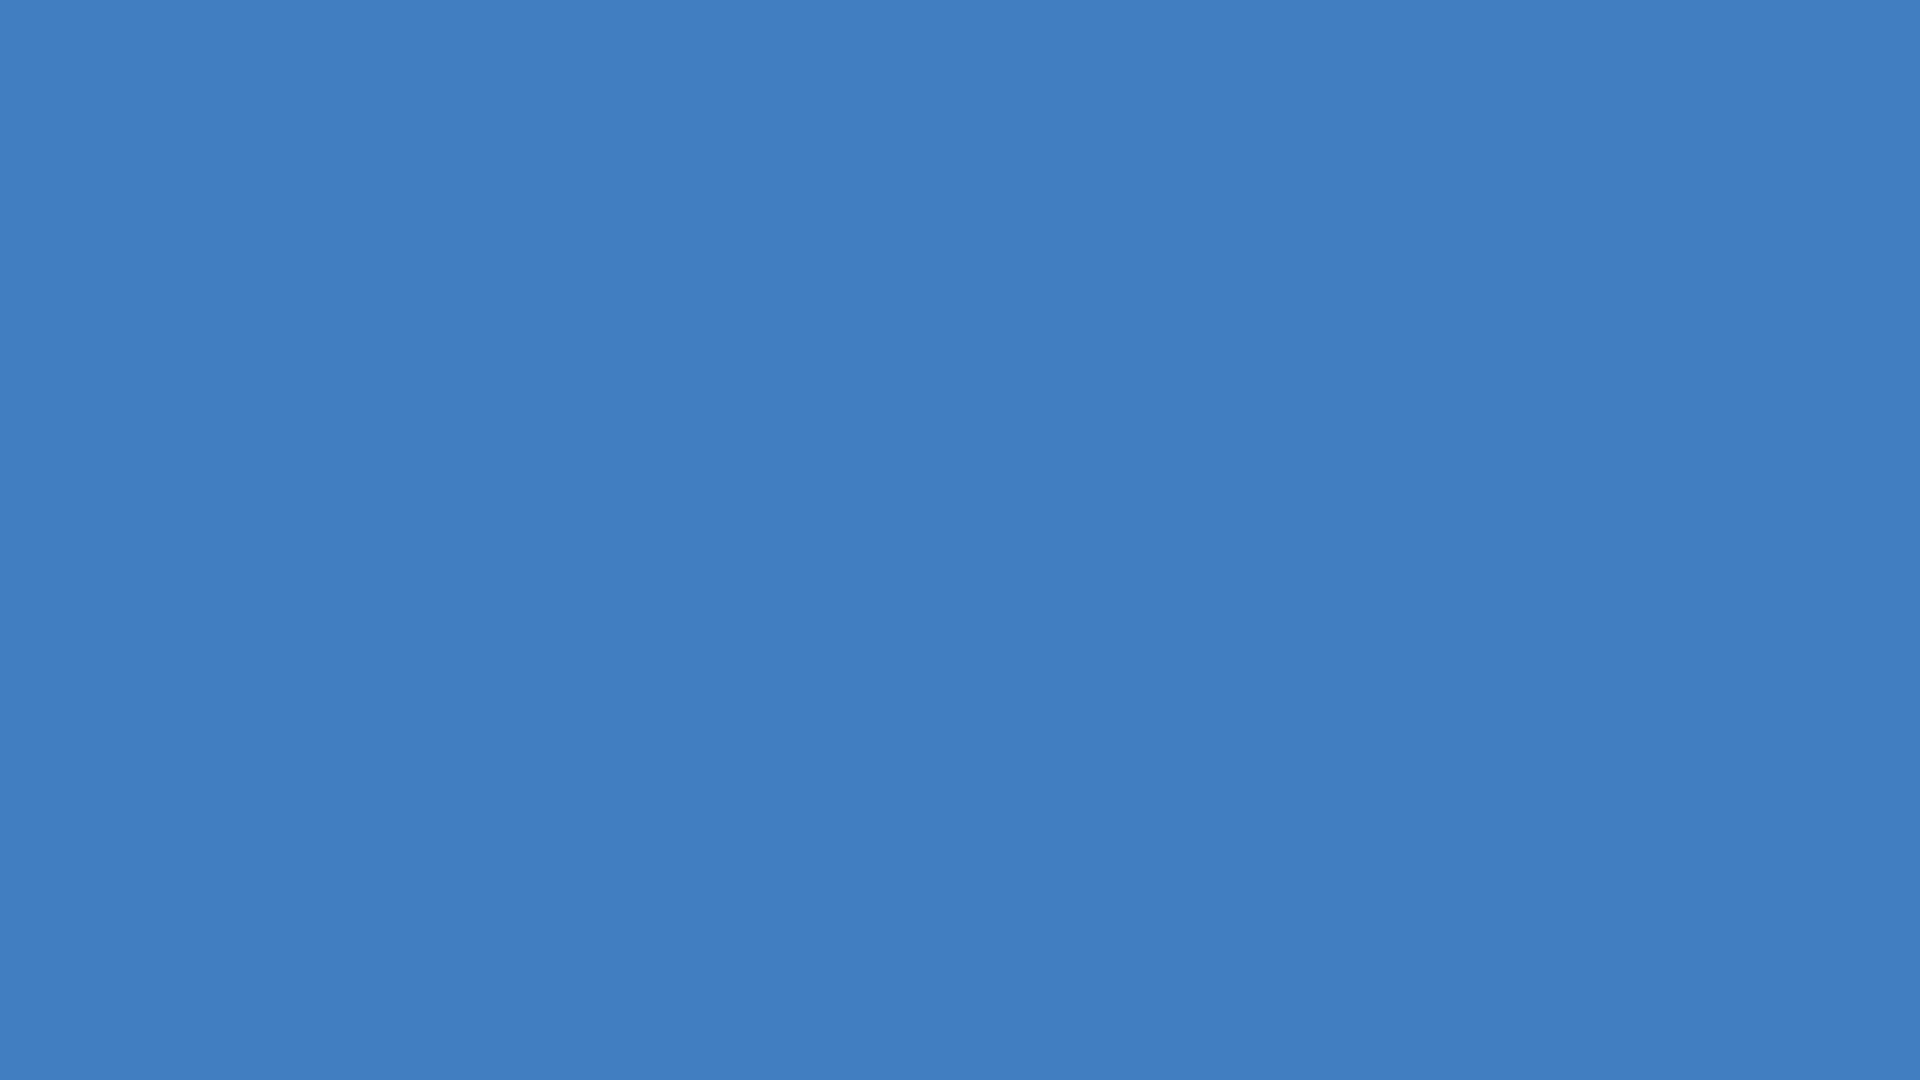 Solid Color HD Wallpapers   PixelsTalk.Net